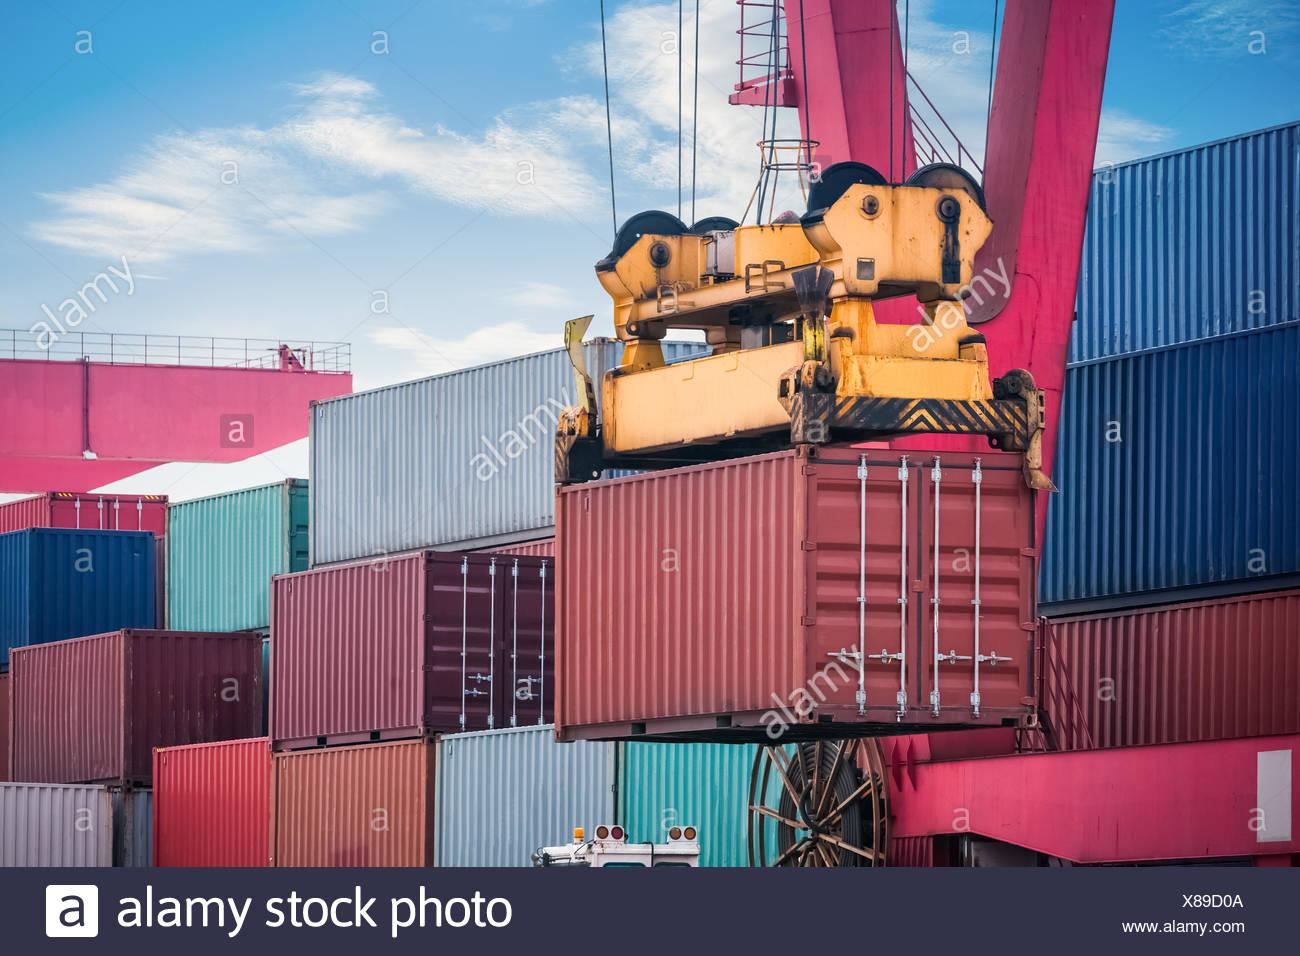 Loading Unloading Of Goods Stock Photos Amp Loading